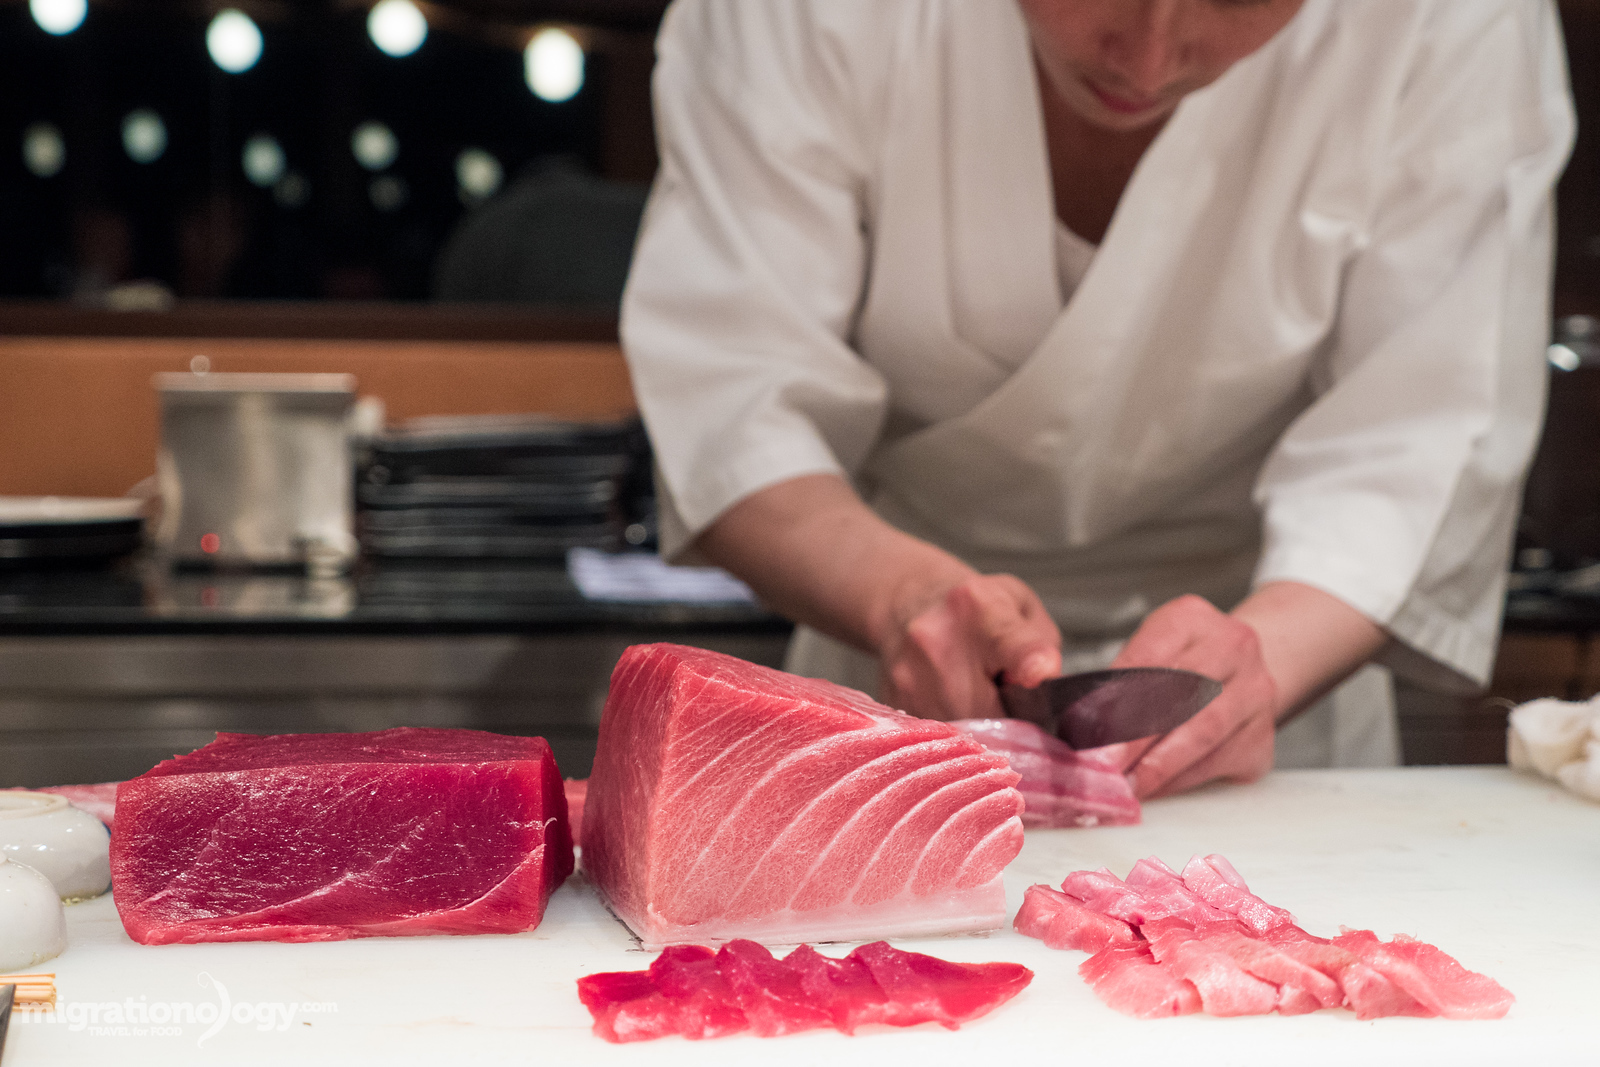 Chef Hiroyuki Sato